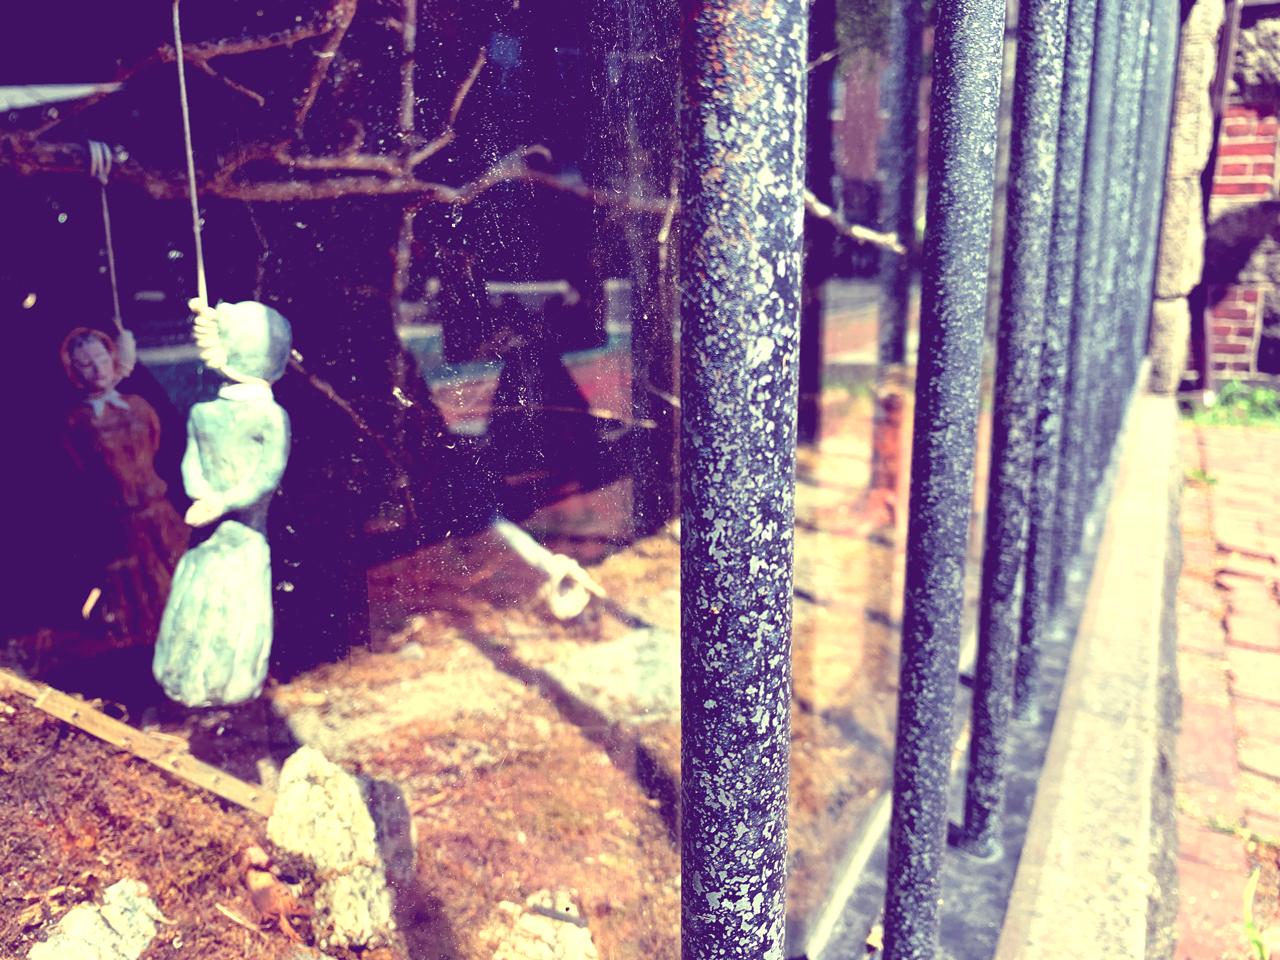 witch-dungeon-museum-salem-massachusetts-1280x960-03